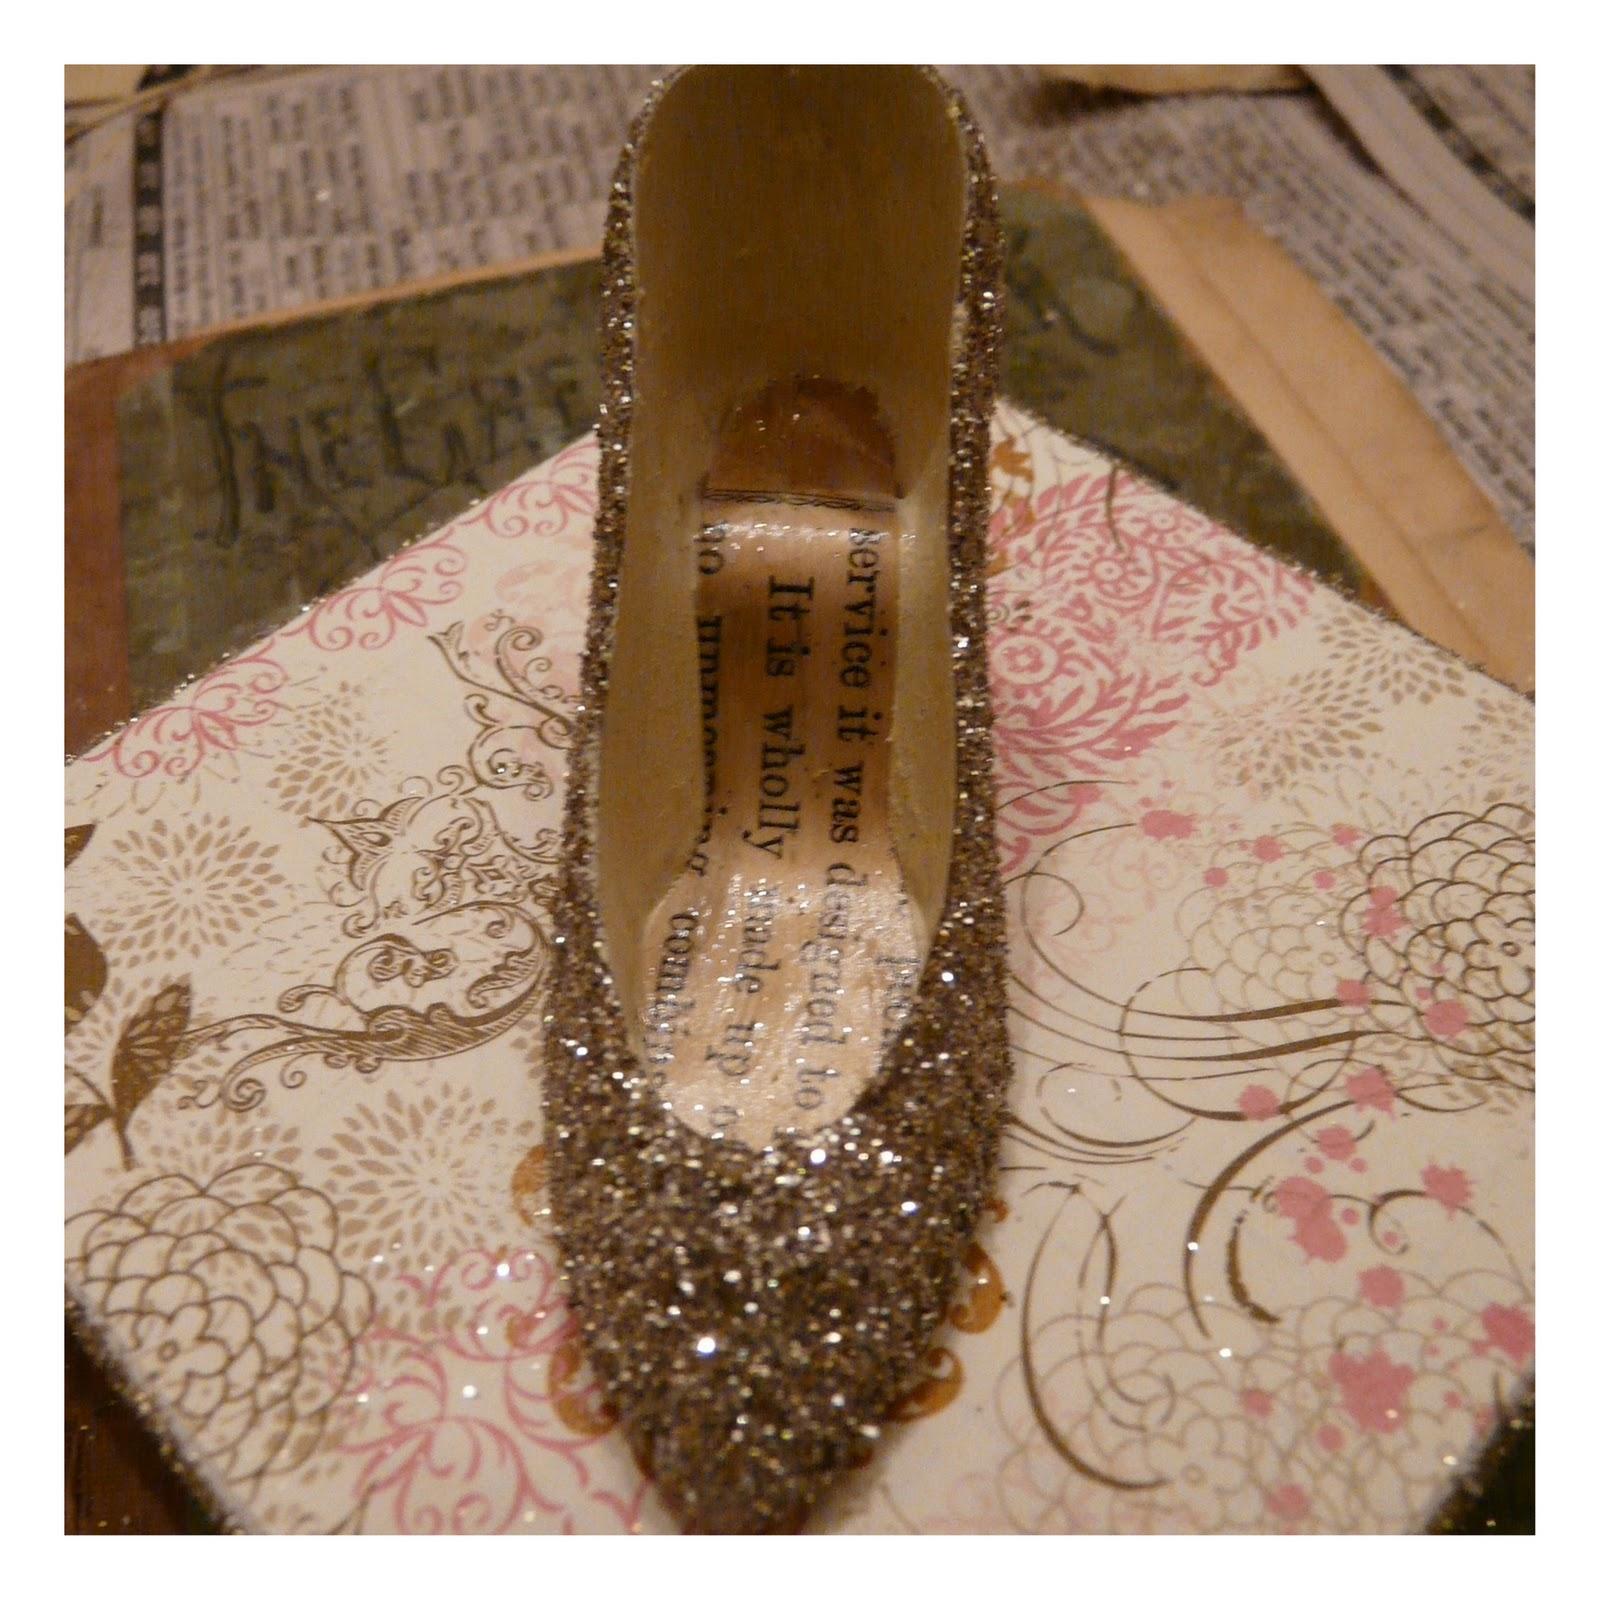 http://1.bp.blogspot.com/_FEZc22SfAy4/TQviVLpXLkI/AAAAAAAADkQ/2uGy35__lYc/s1600/glittered_shoe_gift_box_tutorial8.jpg